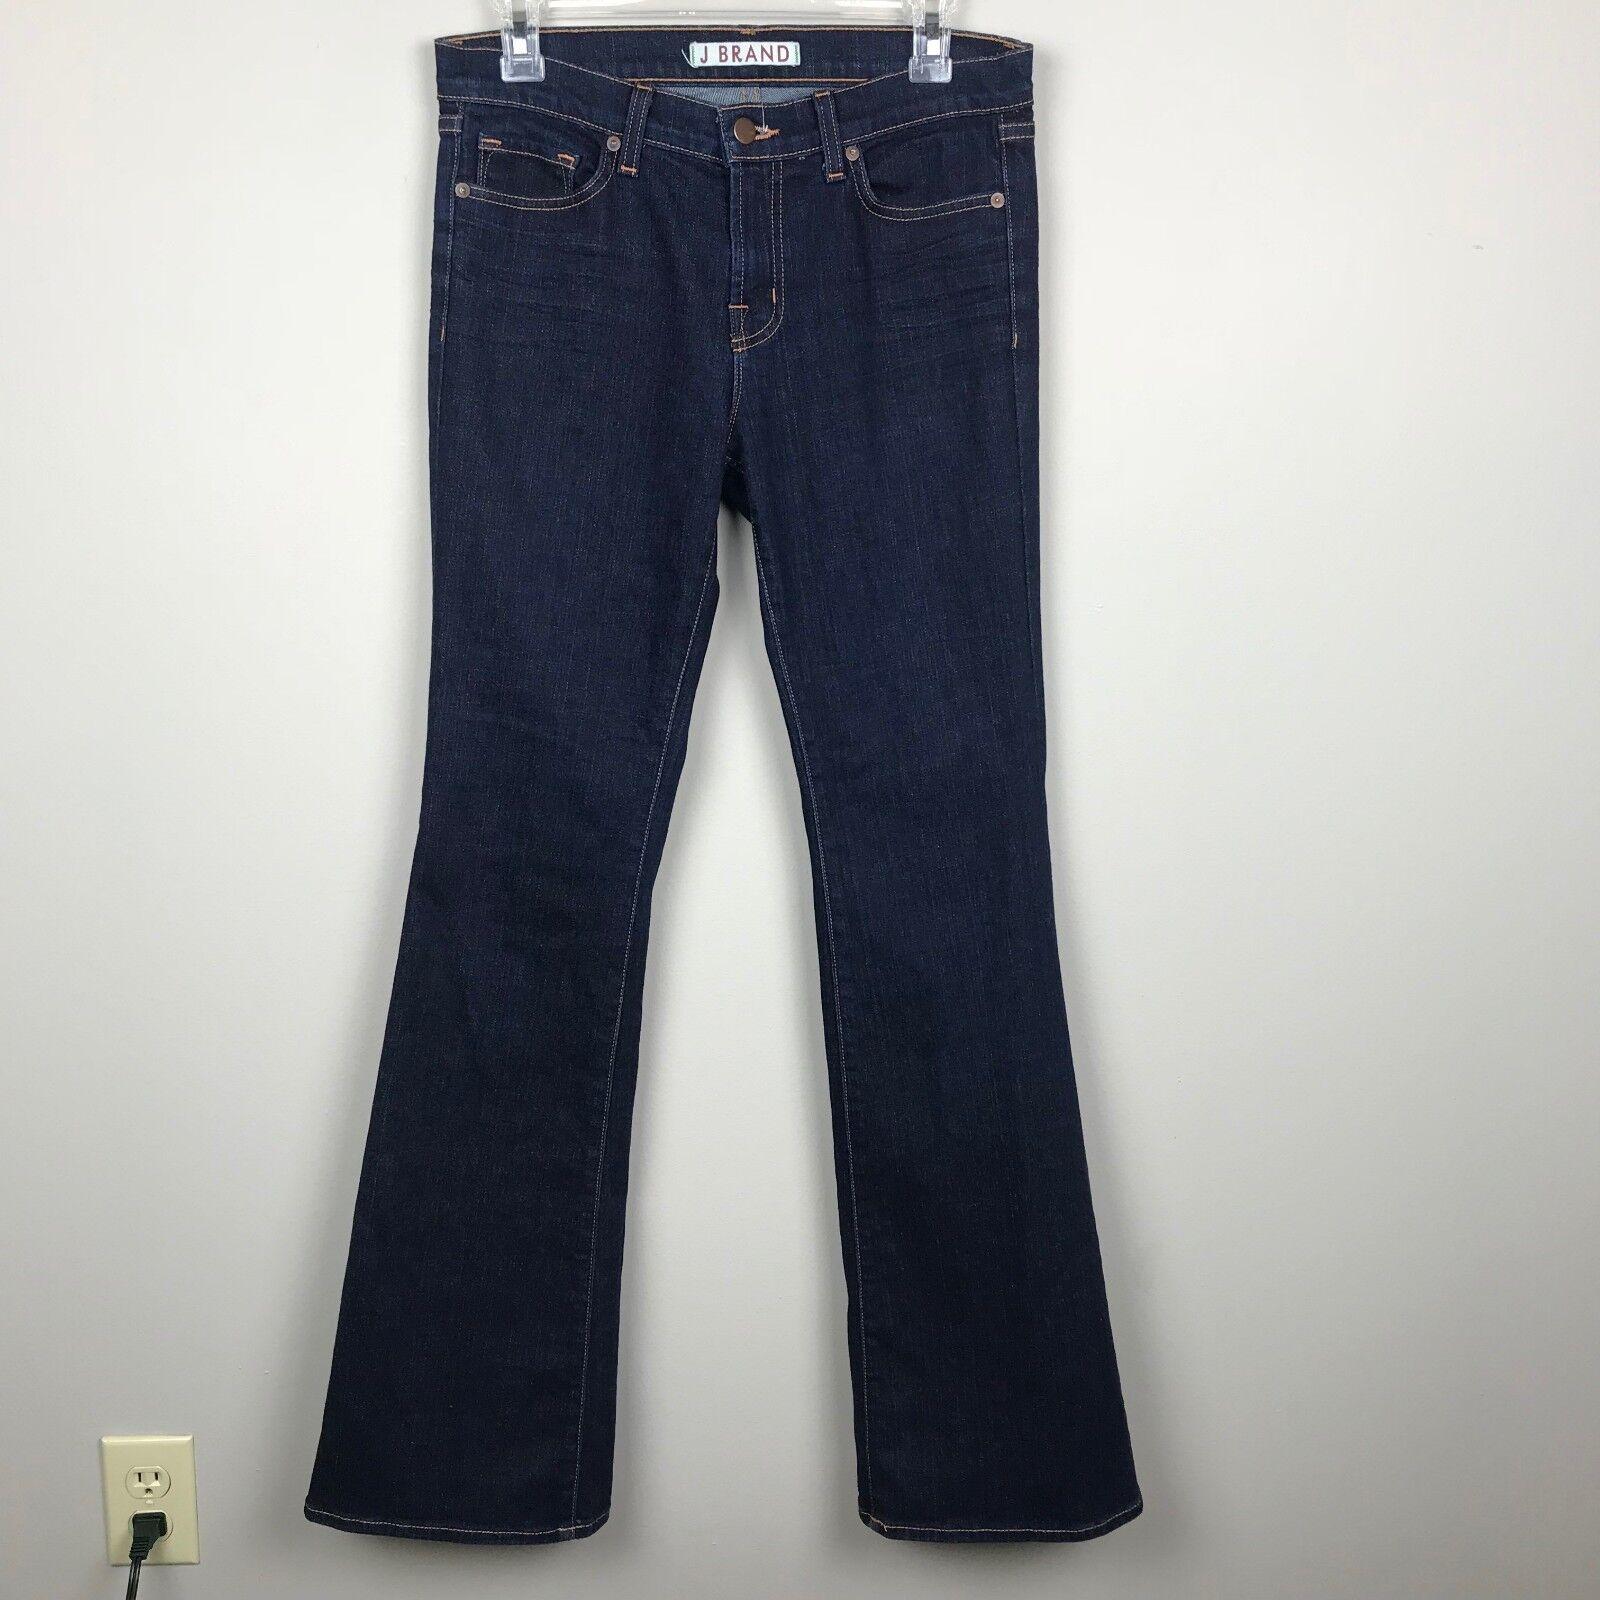 J Brand Women's Size 28 Jeans Flare Wide Leg Dark Wash 800 Ink